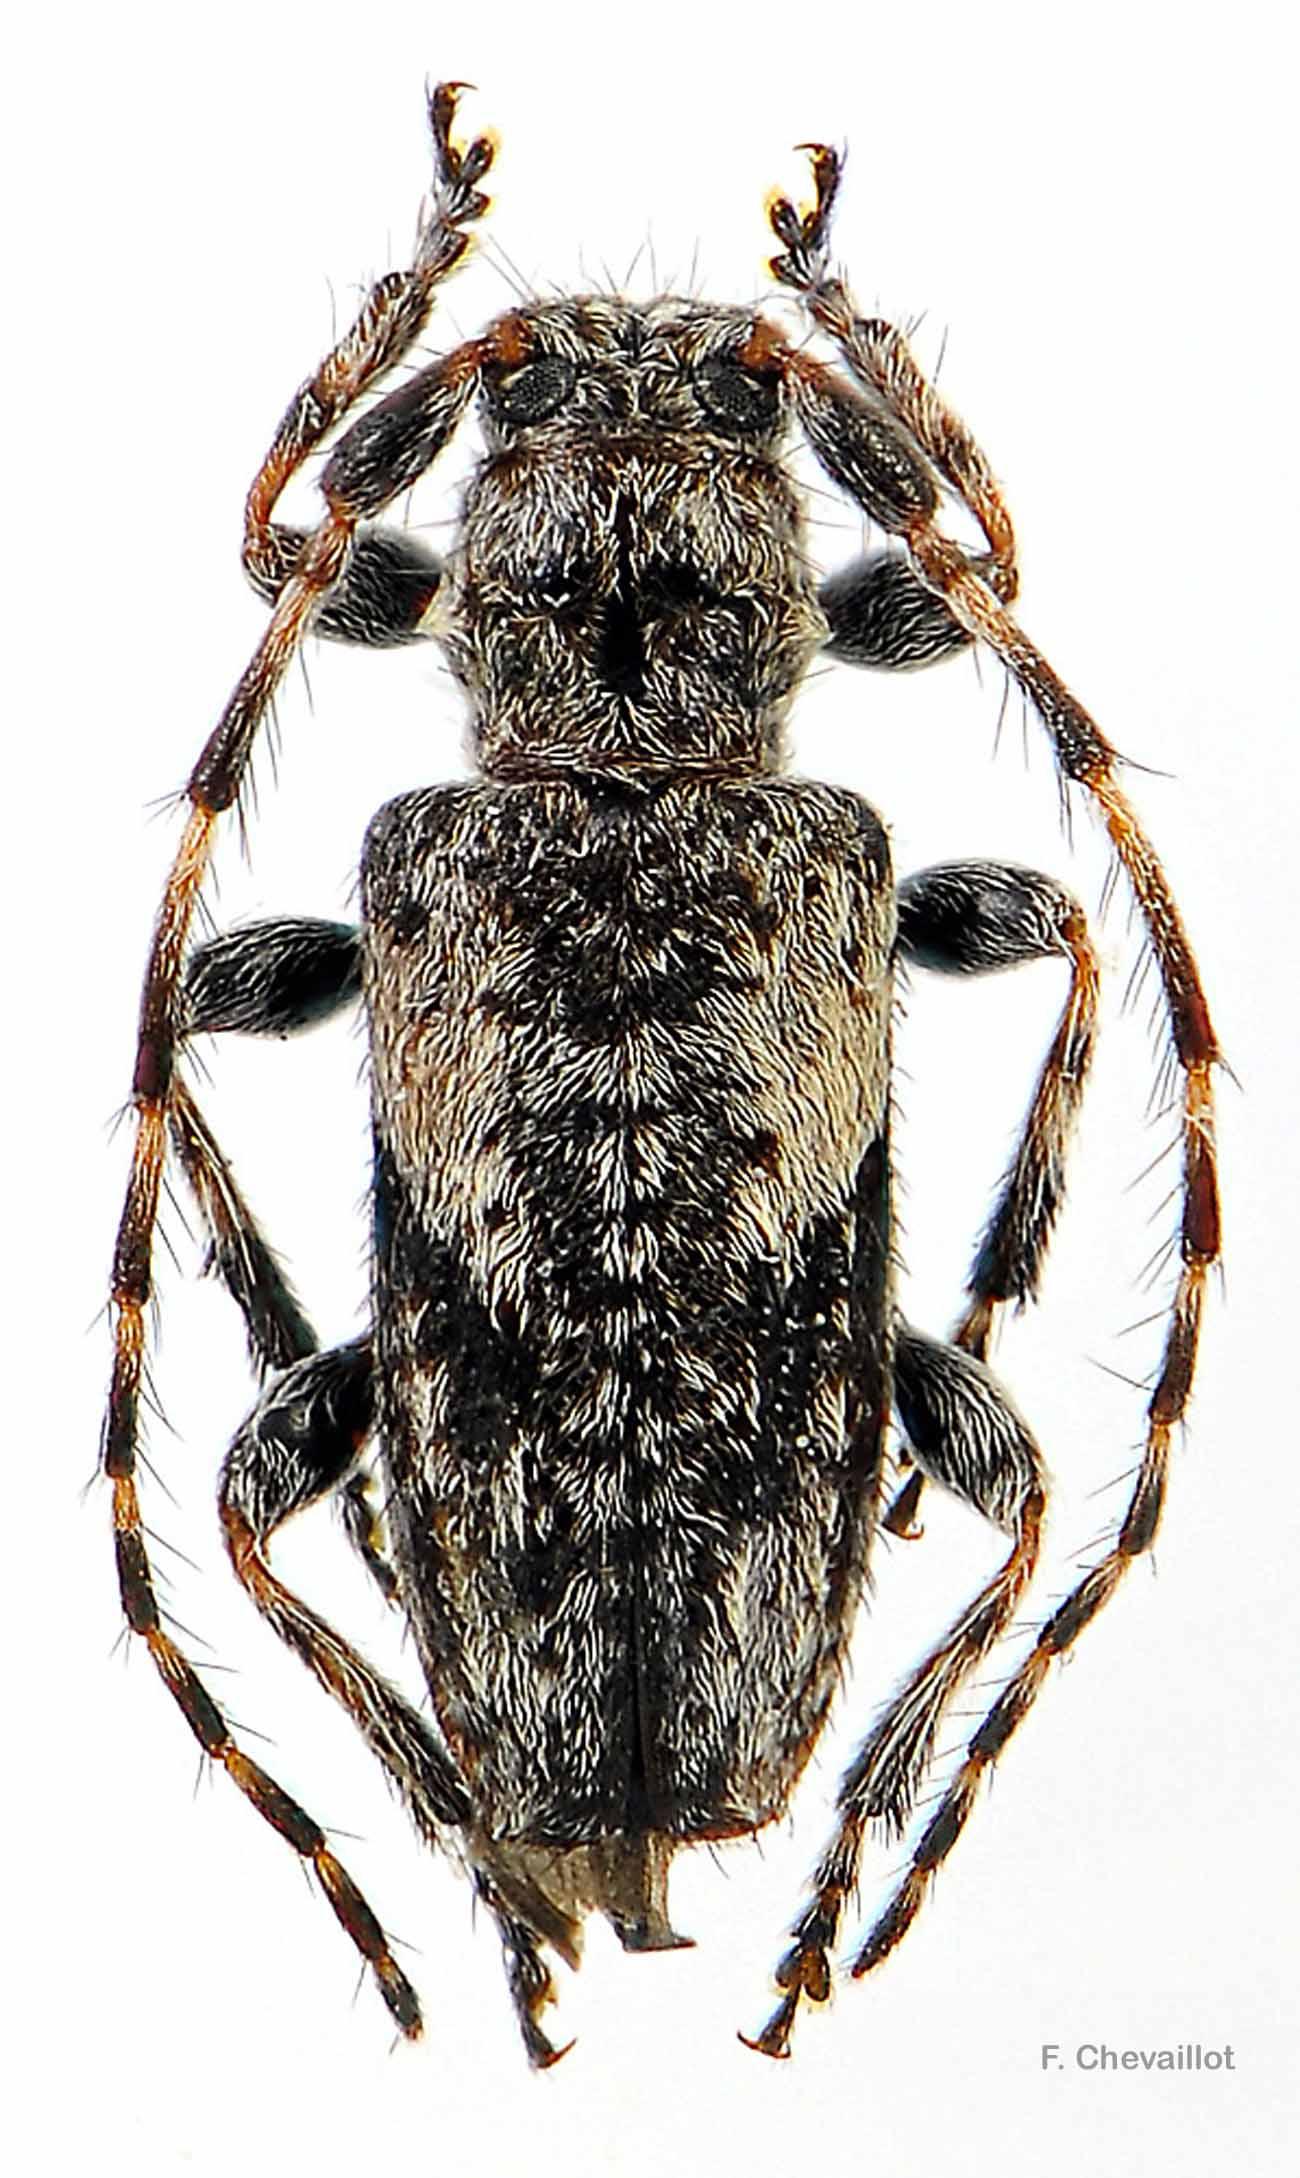 Pogonocherus decoratus